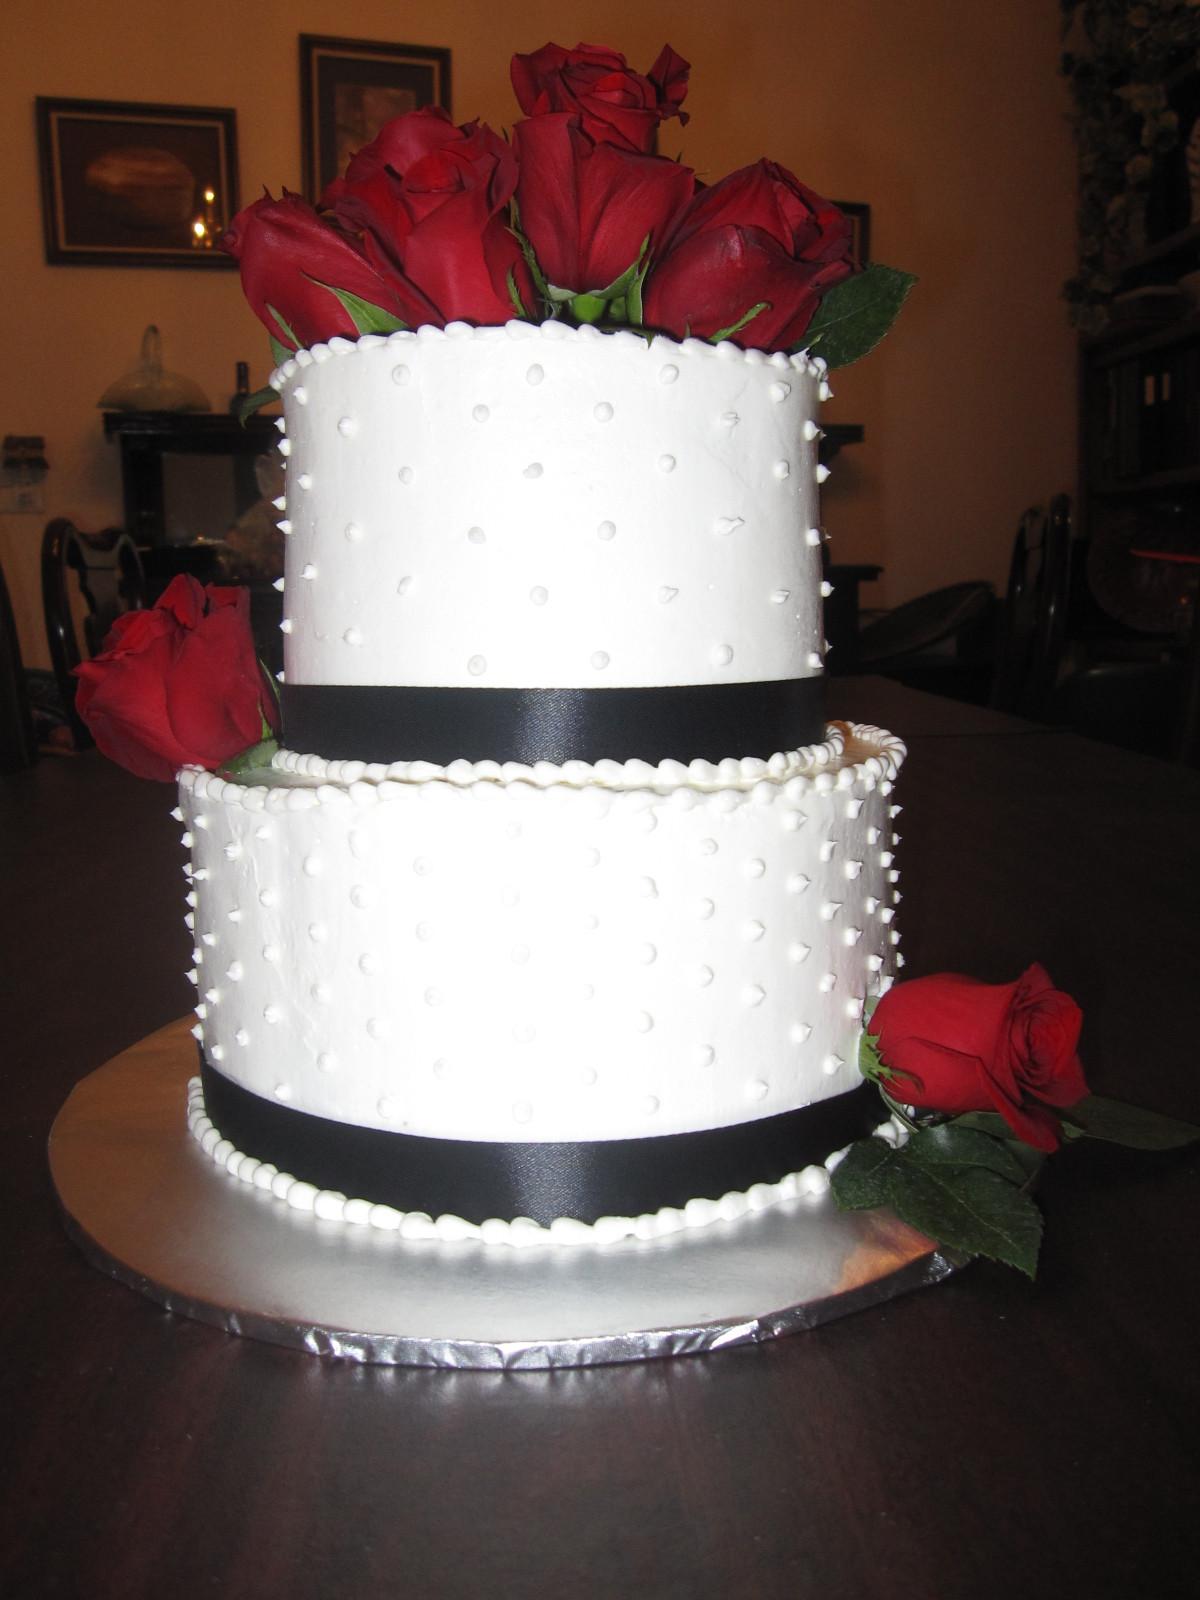 Costco Wedding Cakes  Costco wedding cakes idea in 2017